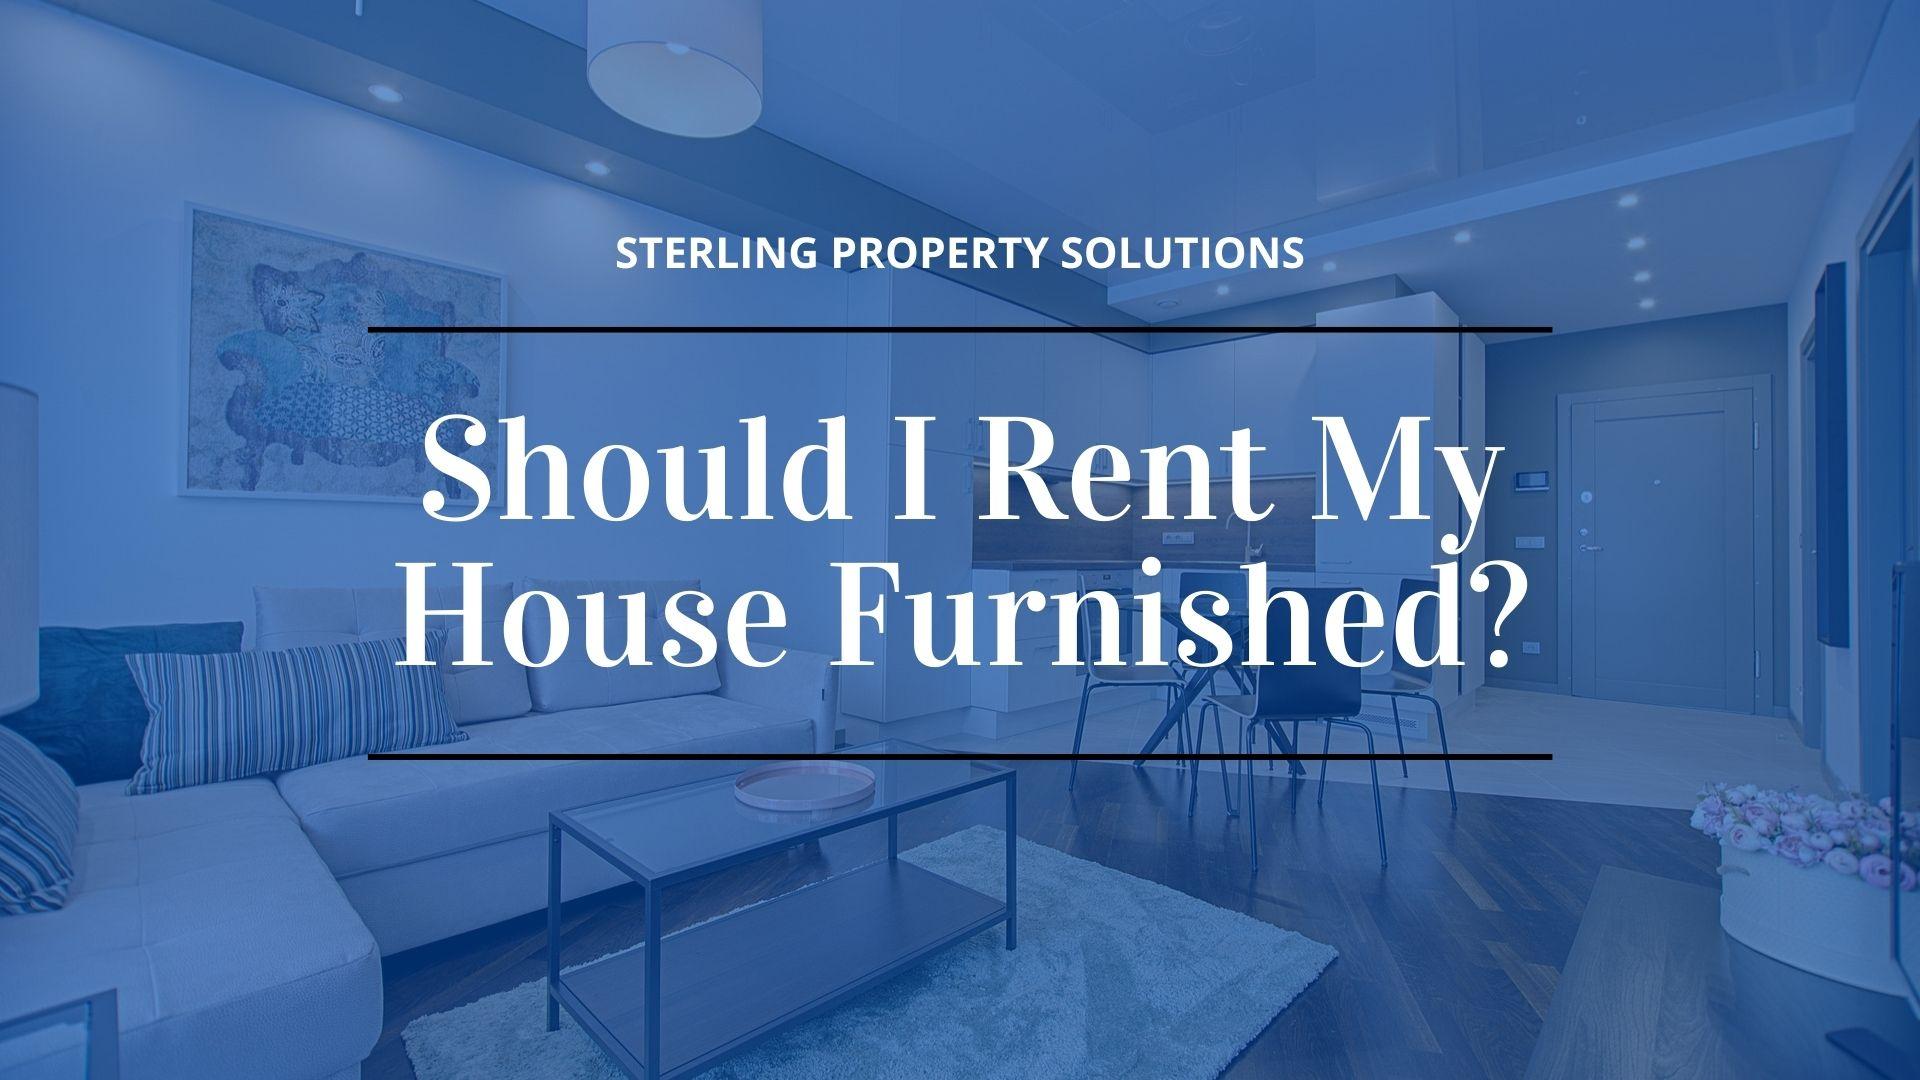 should I rent my house furnished